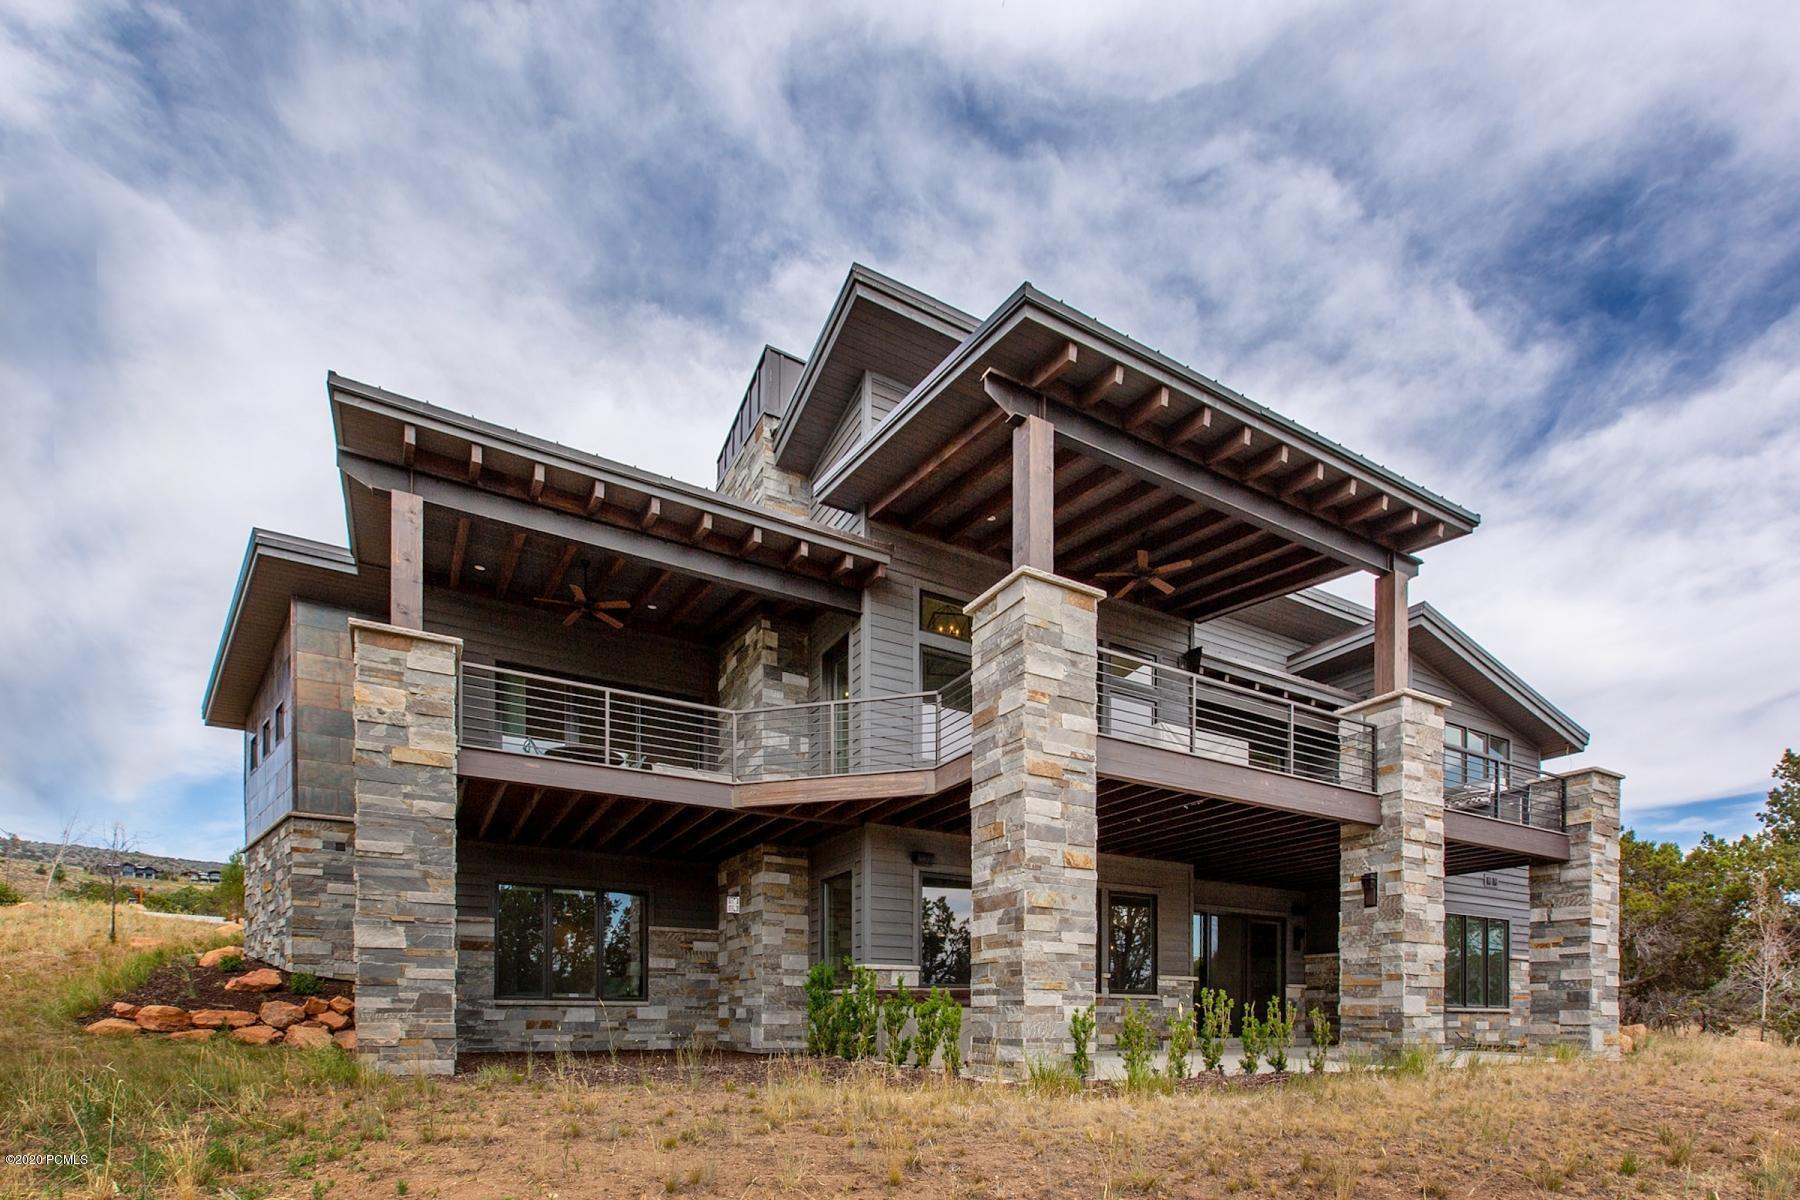 675 Bald Mountain Cir (Lot 269), Heber City, Utah 84032, 6 Bedrooms Bedrooms, ,Single Family,For Sale,Bald Mountain Cir (Lot 269),12002759